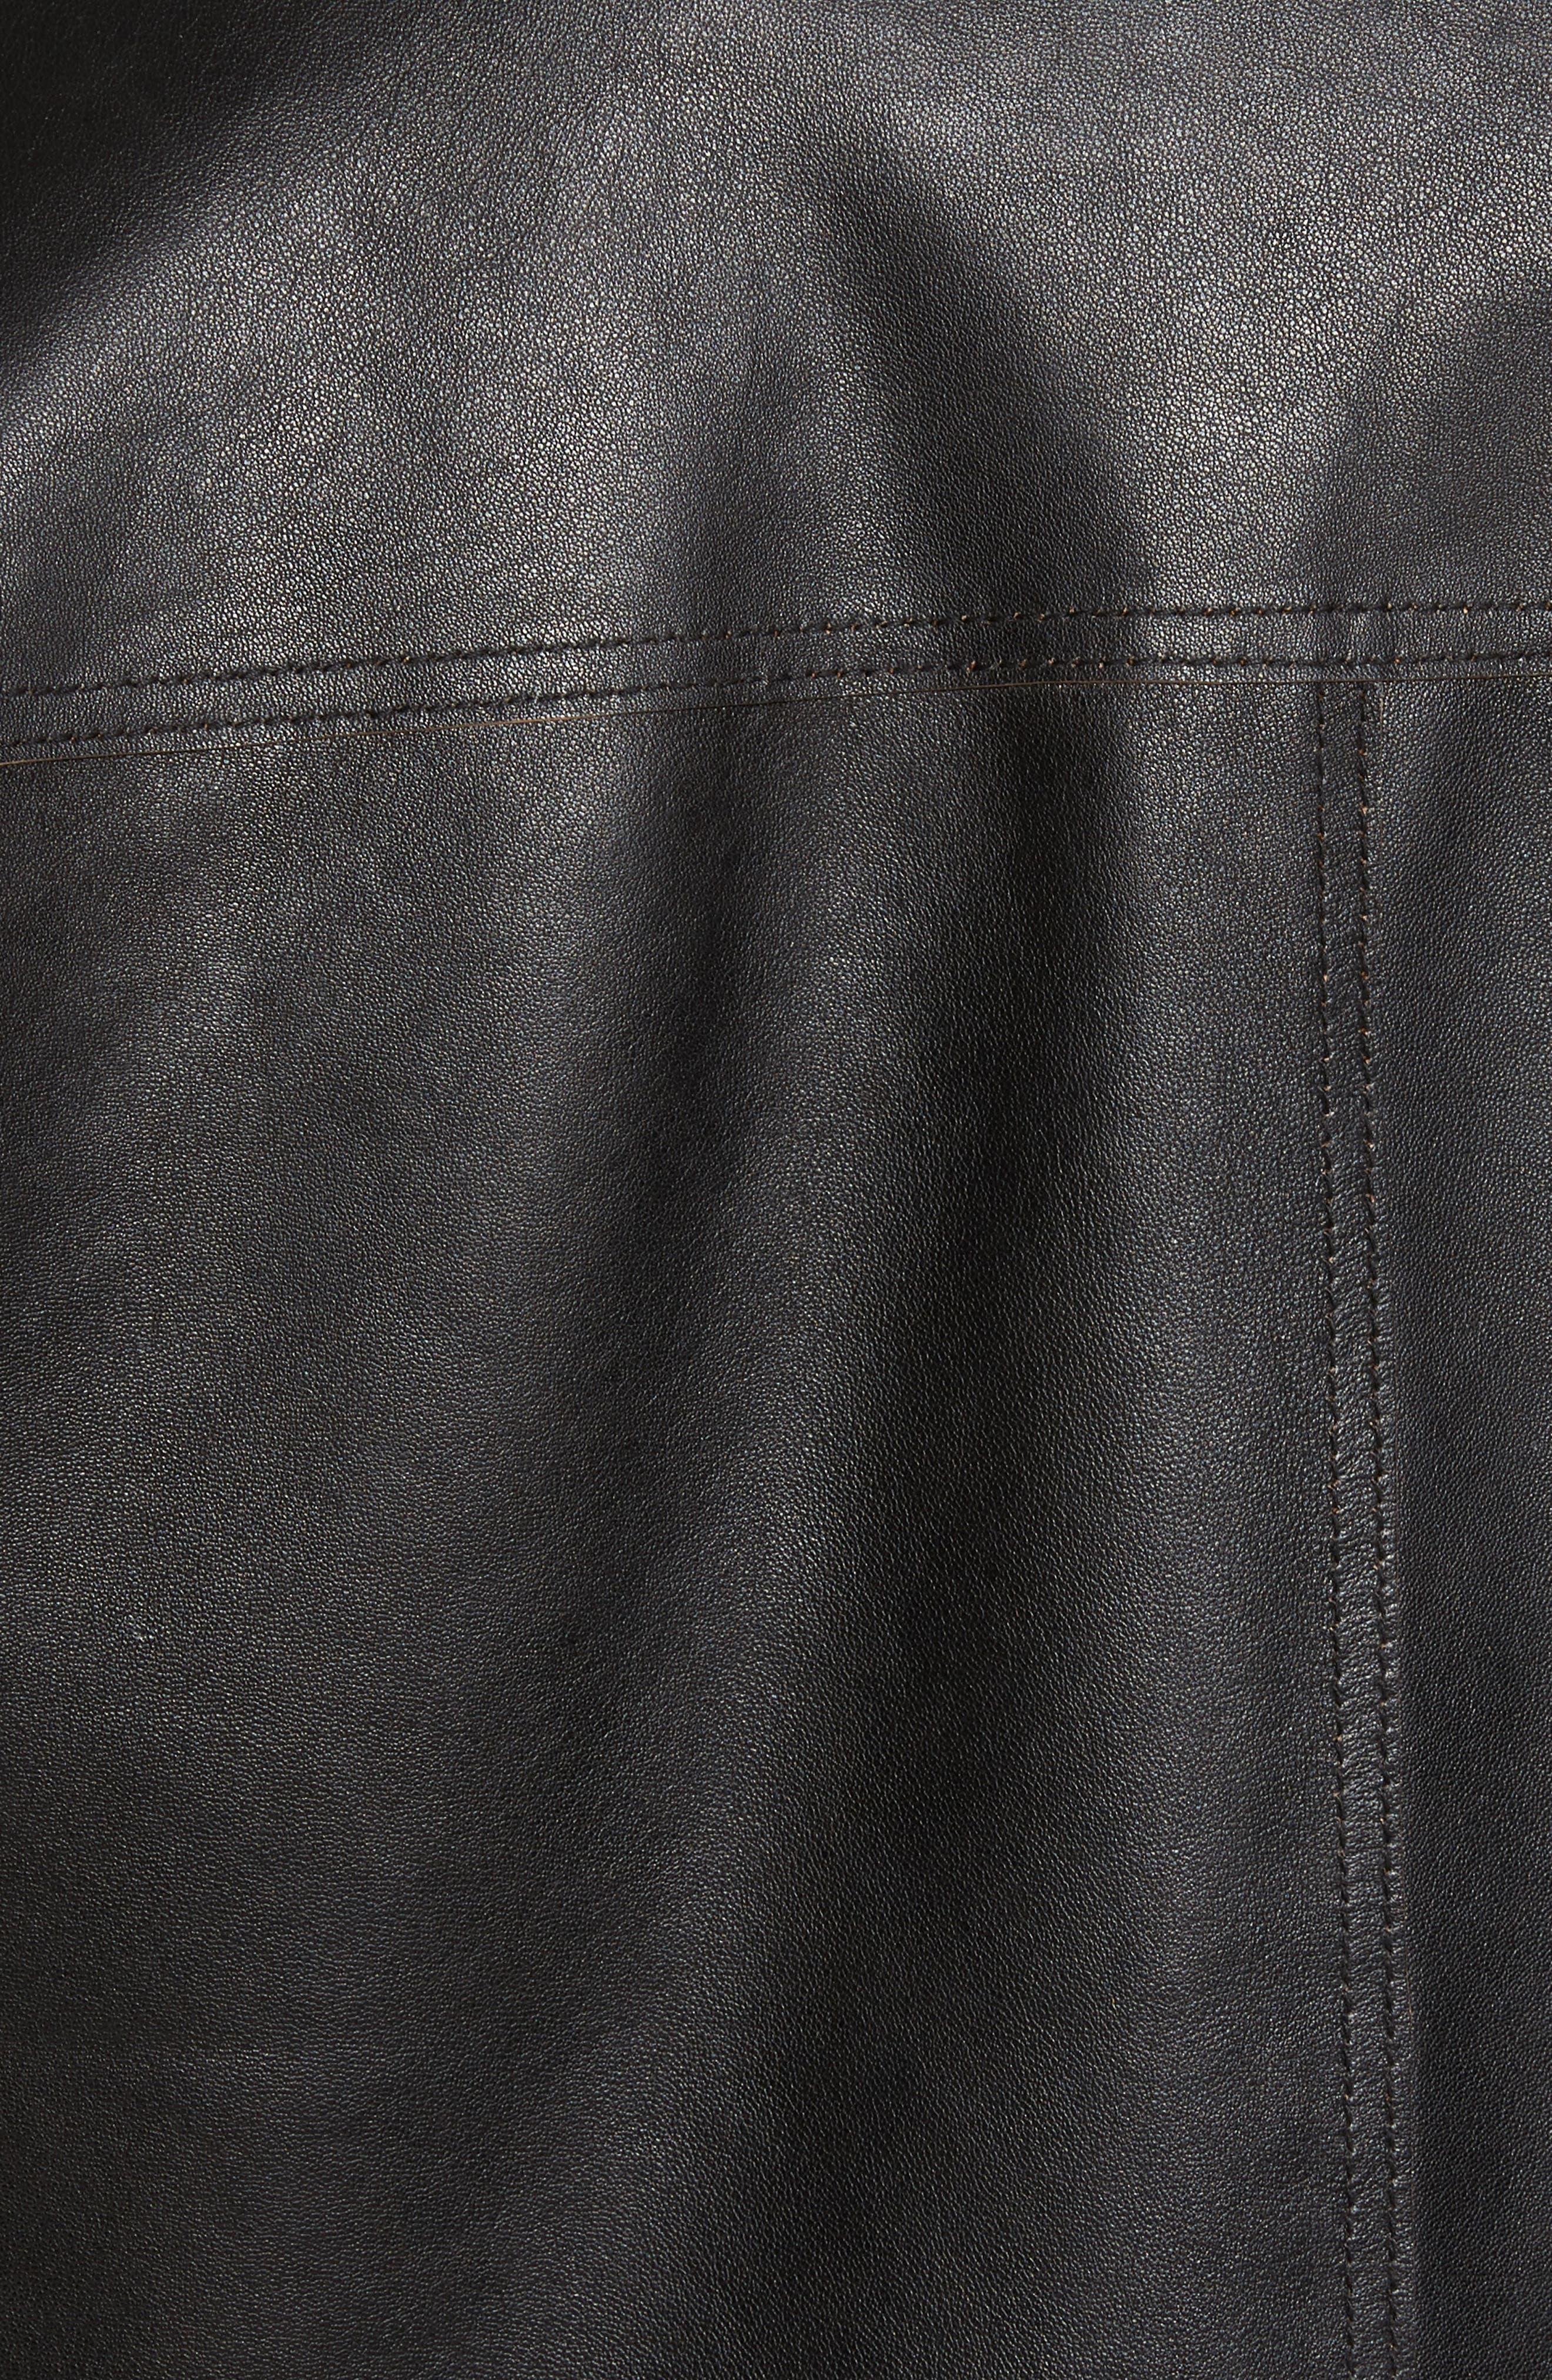 Reversible Leather Jacket,                             Alternate thumbnail 5, color,